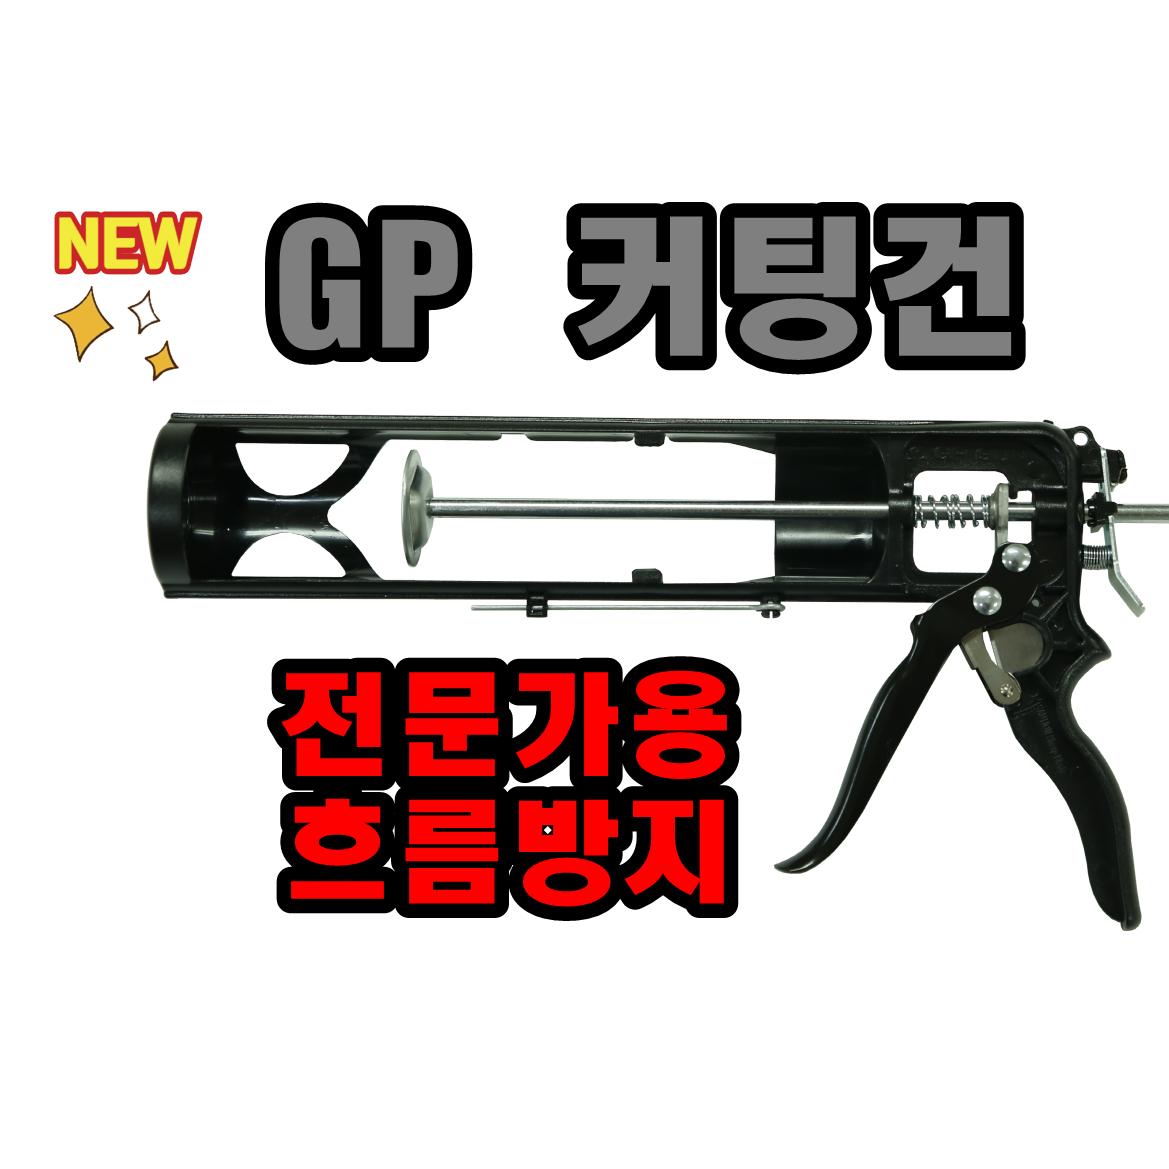 INVEN*투엔티원 신형 NEW GP 고급 실리콘 커팅건 (전무가용 흐름방지 칼건) (POP 1667226037)